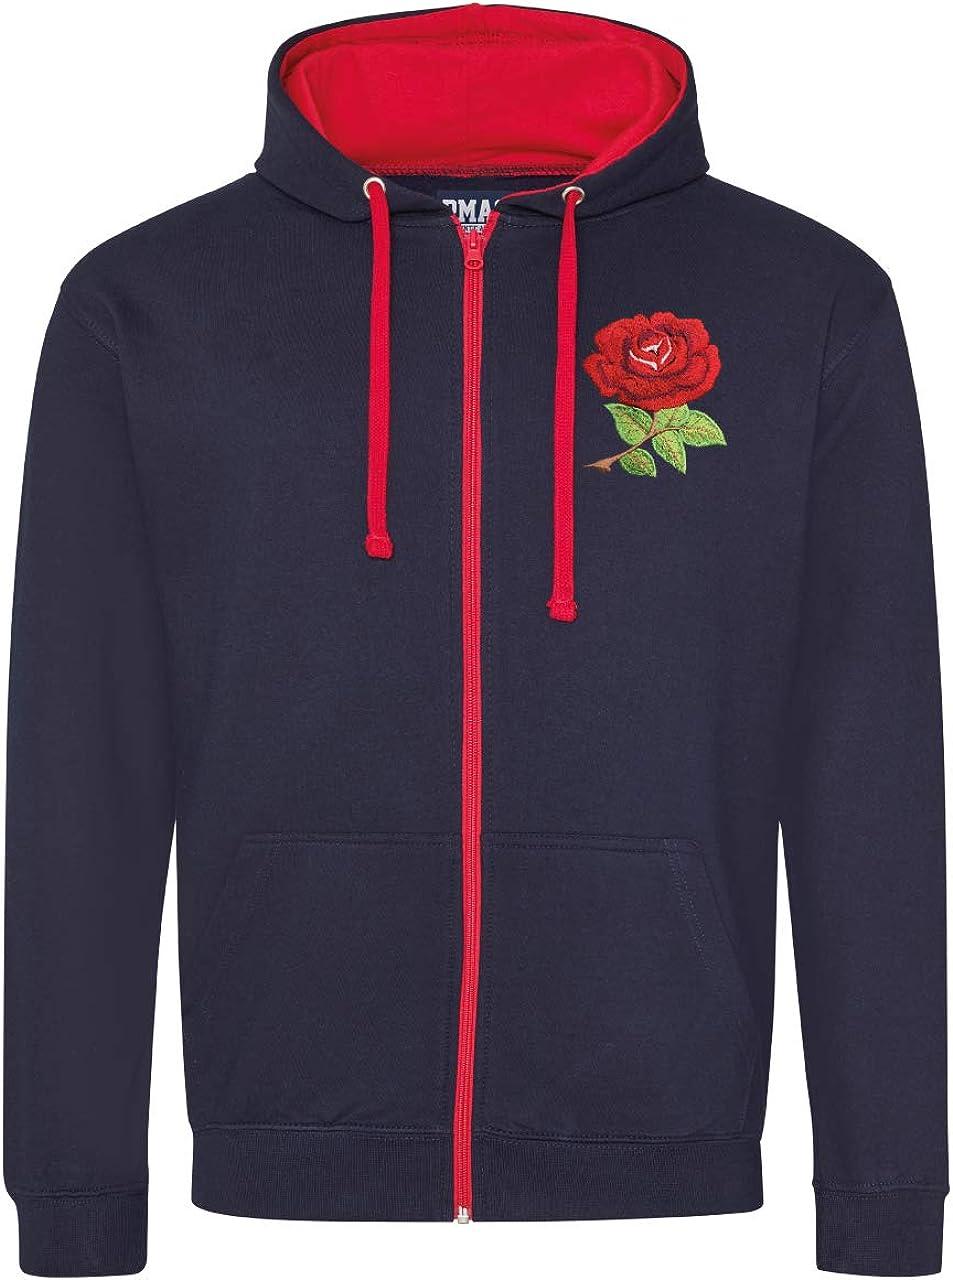 Unisex Adult Vintage Retro England English Rose Rugby Zipped Hoodie